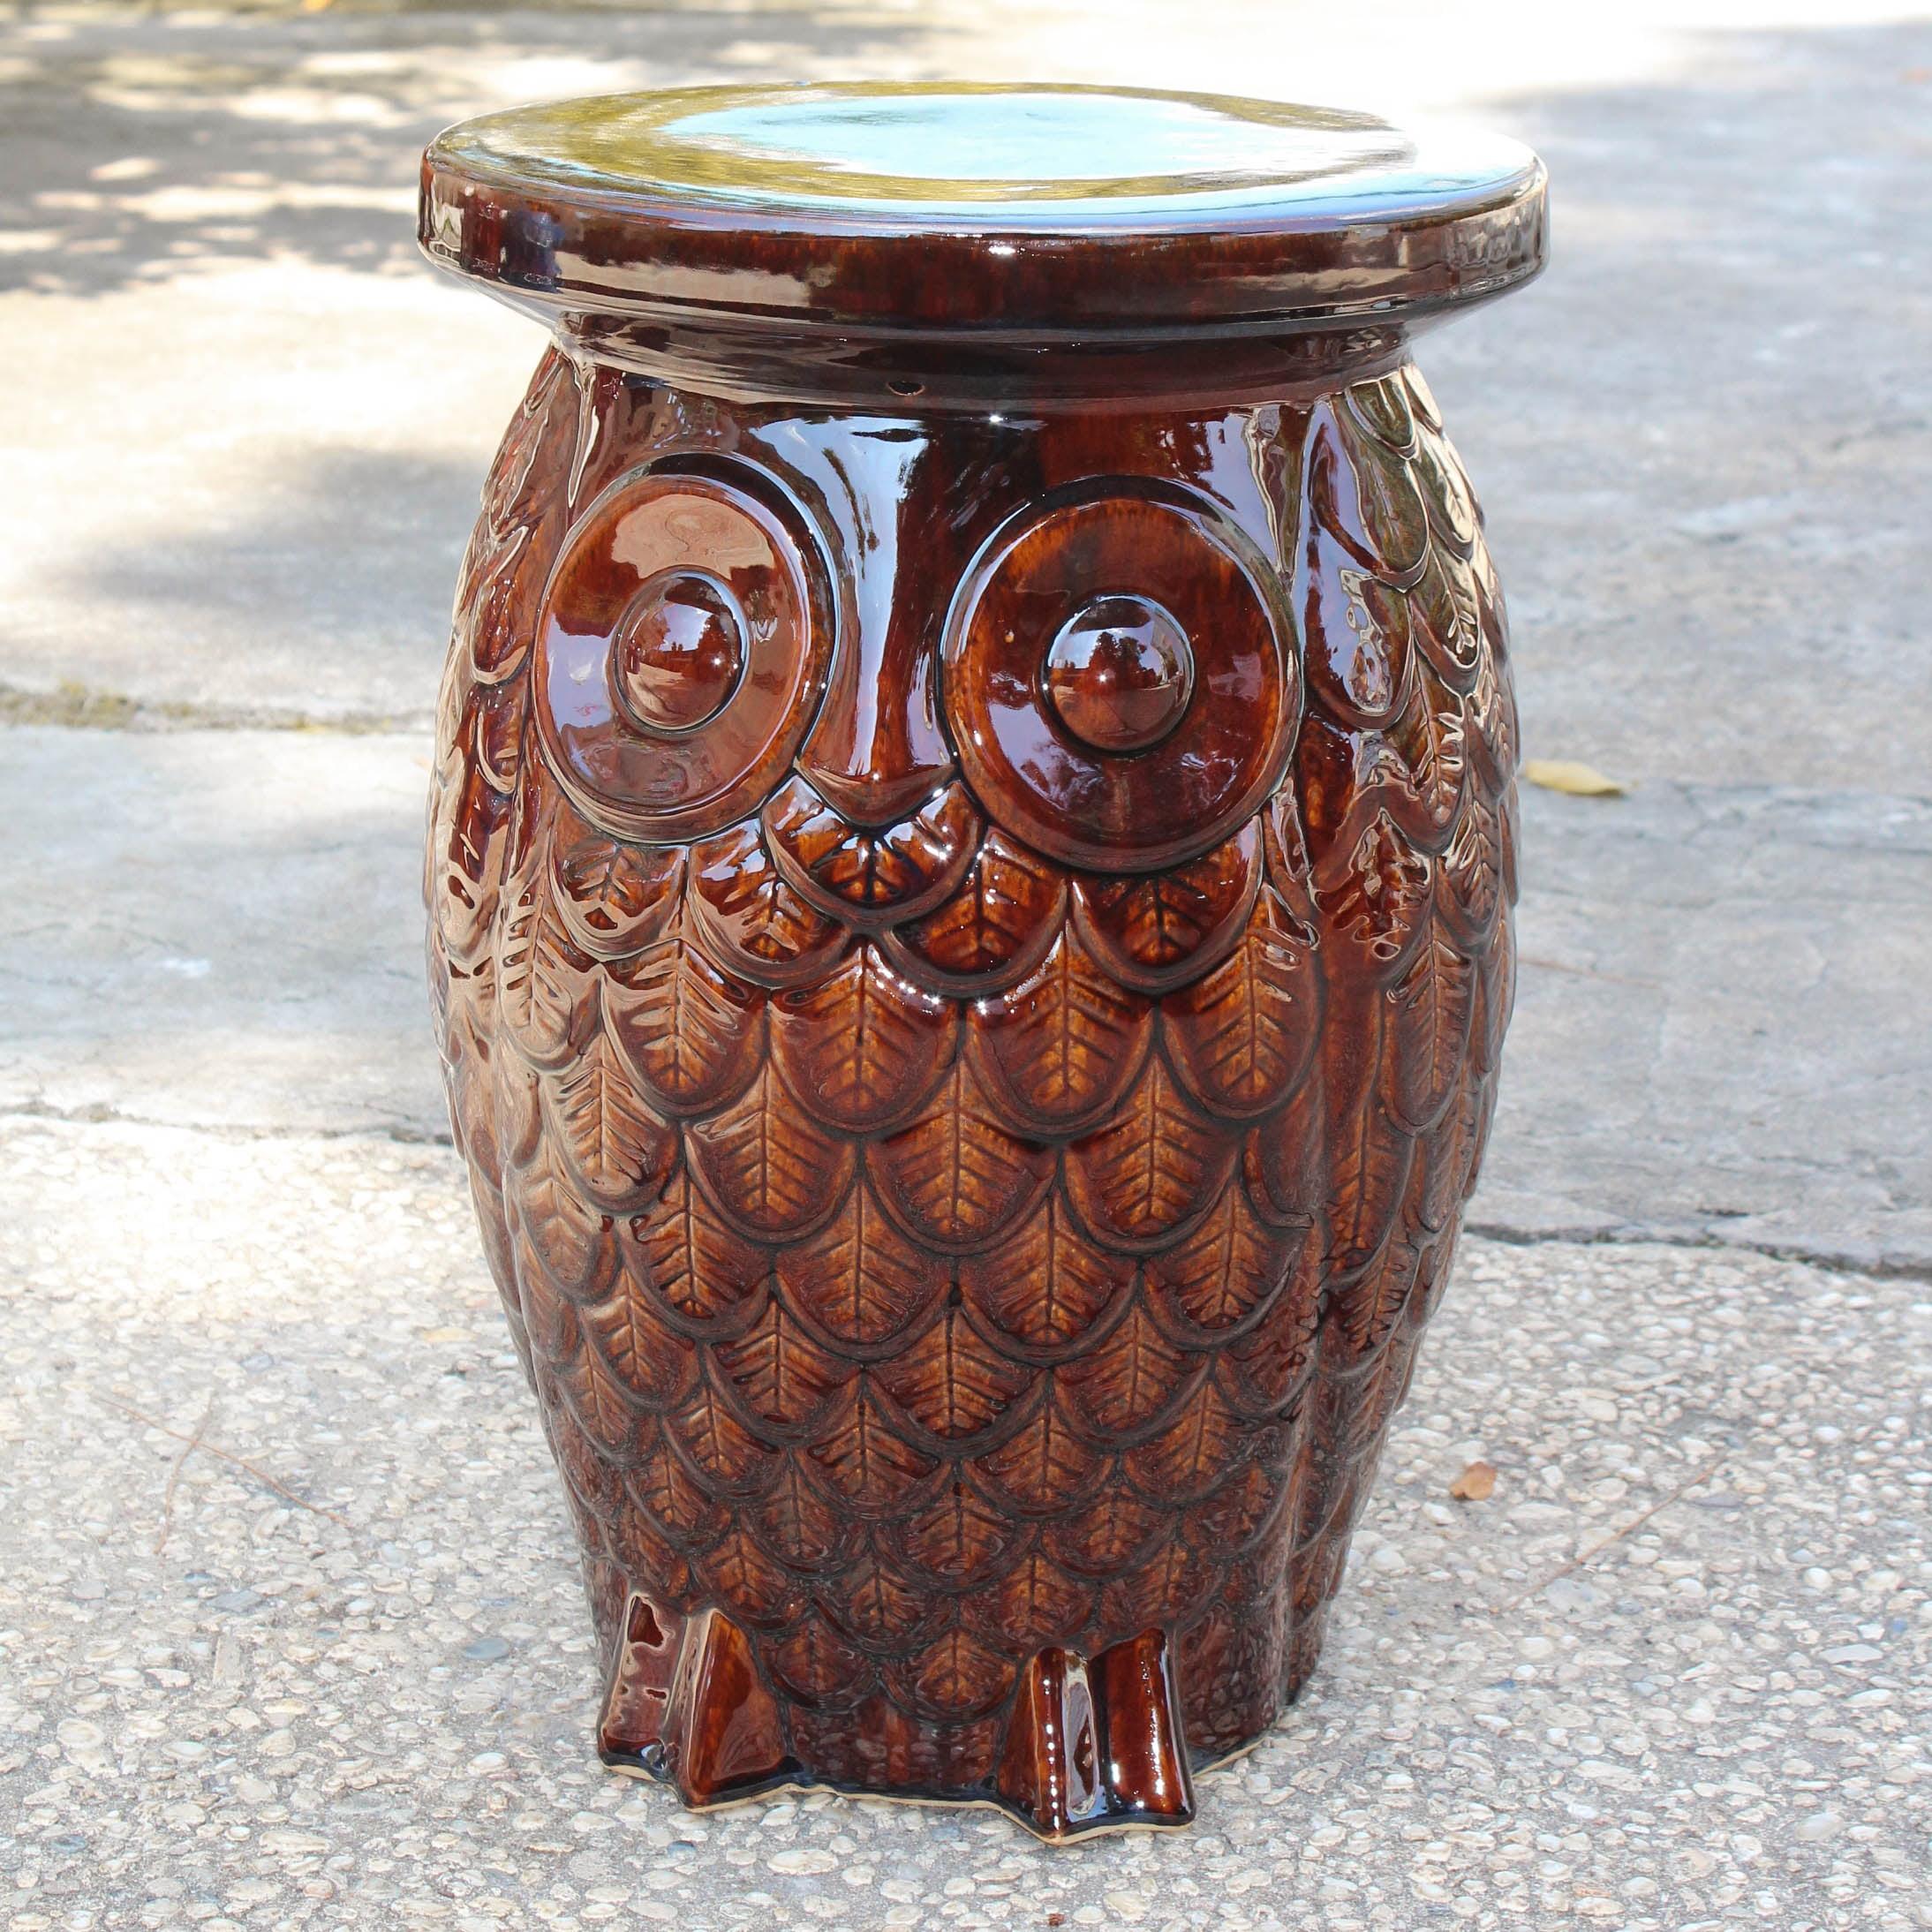 International Caravan Wise Old Owl Ceramic Garden Stool